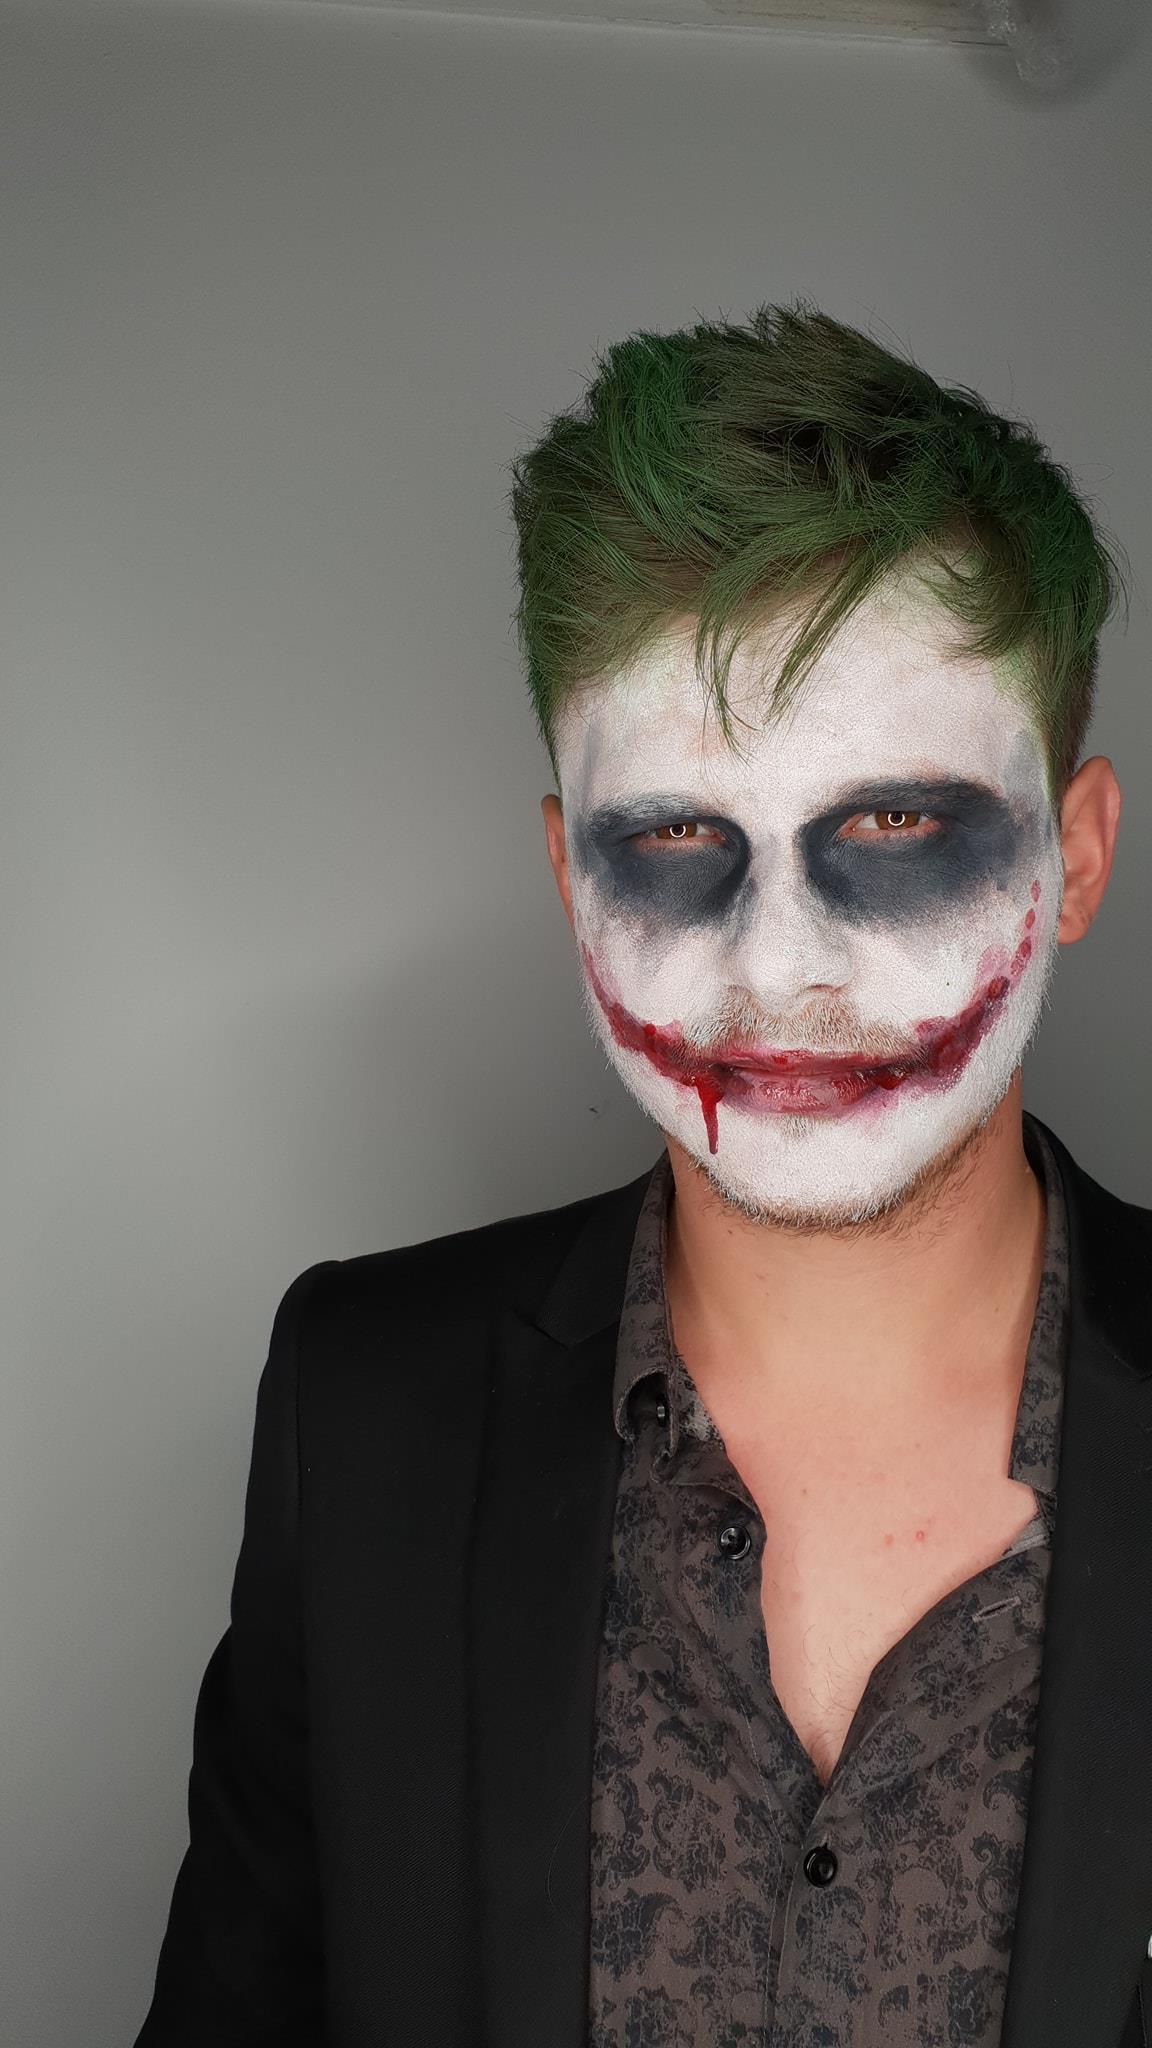 Jagermeister Halloween Party Machiaj Prostetic Romania joker